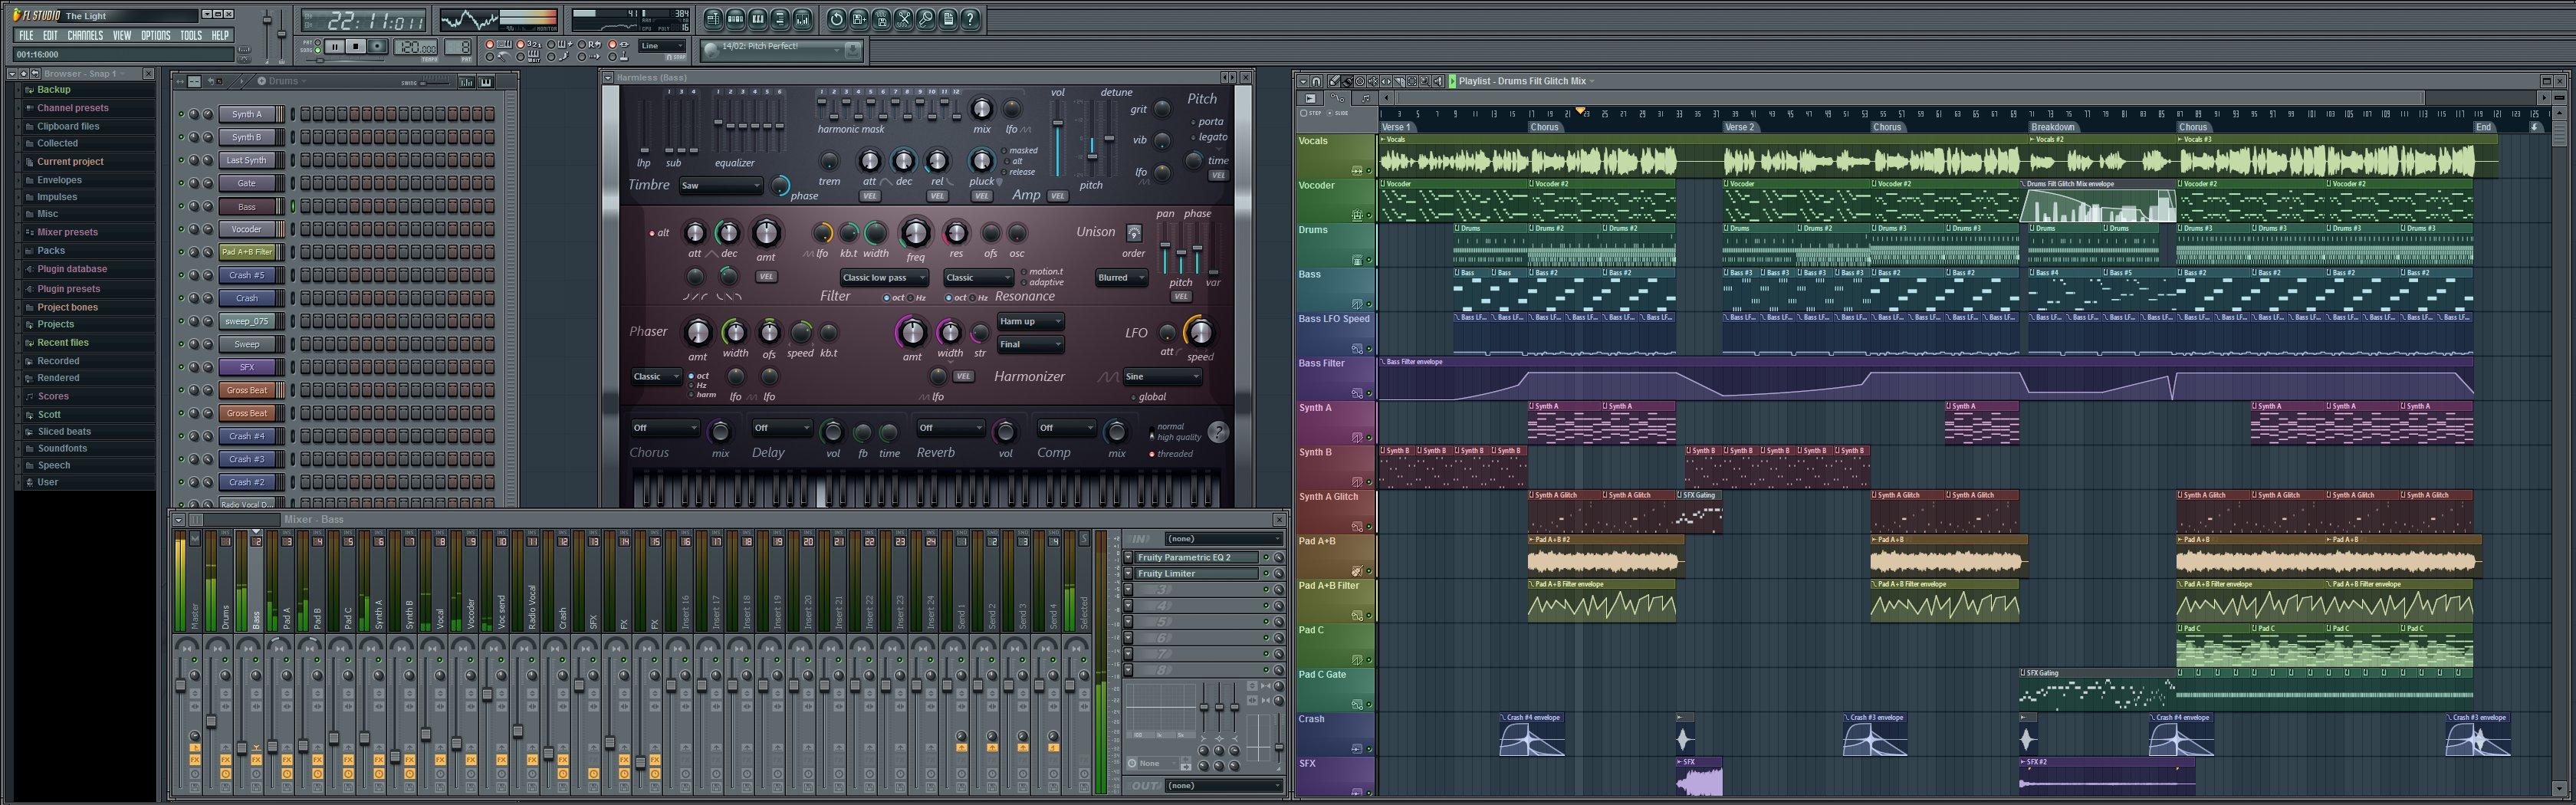 Fl studio 10 0 9c producer edition final key thetorrent